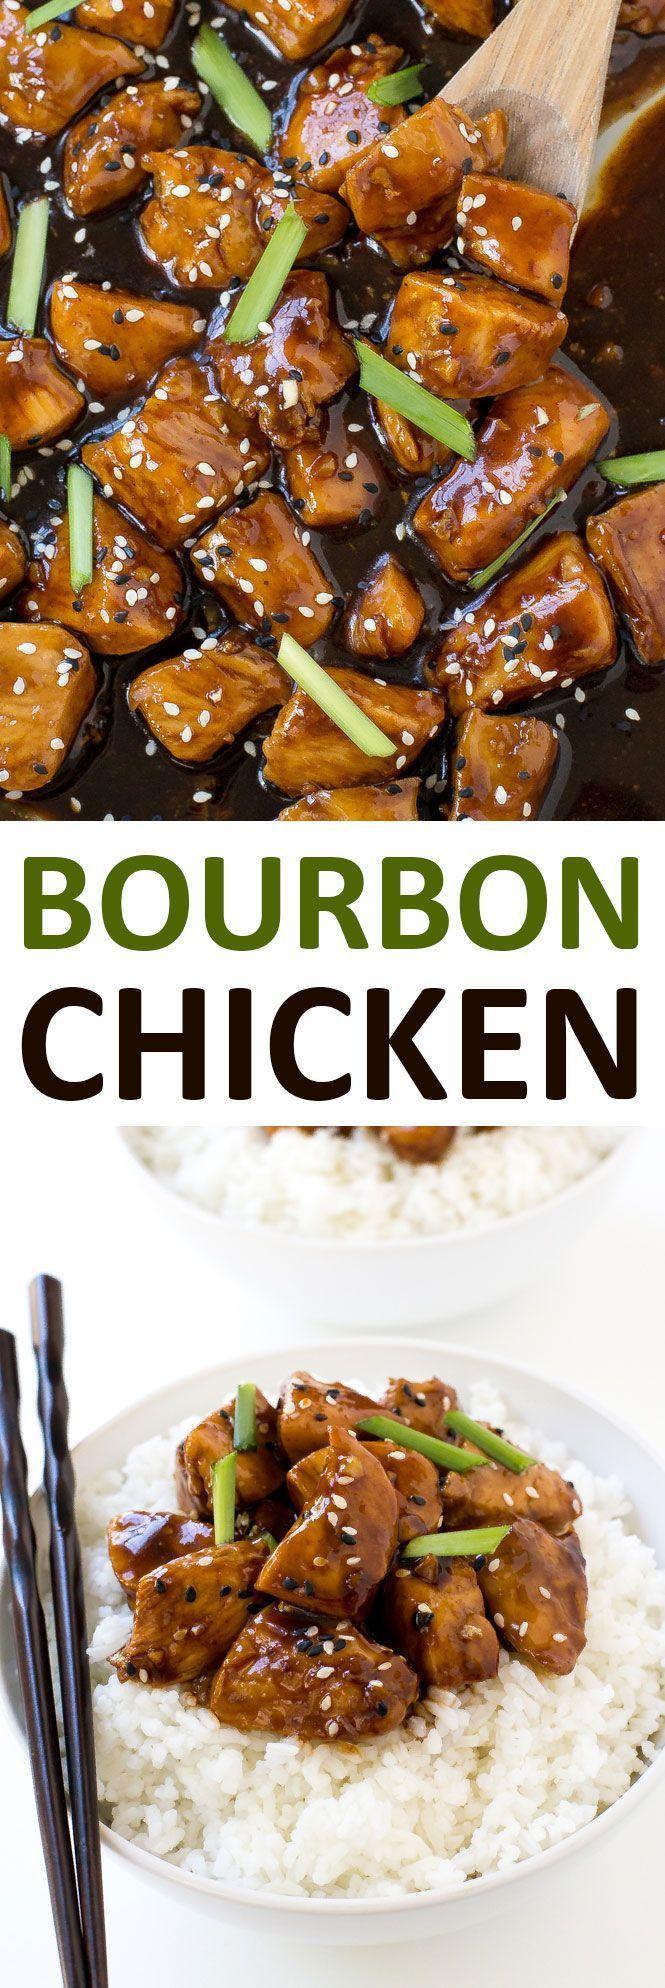 Bourbon Chicken - Chef Savvy